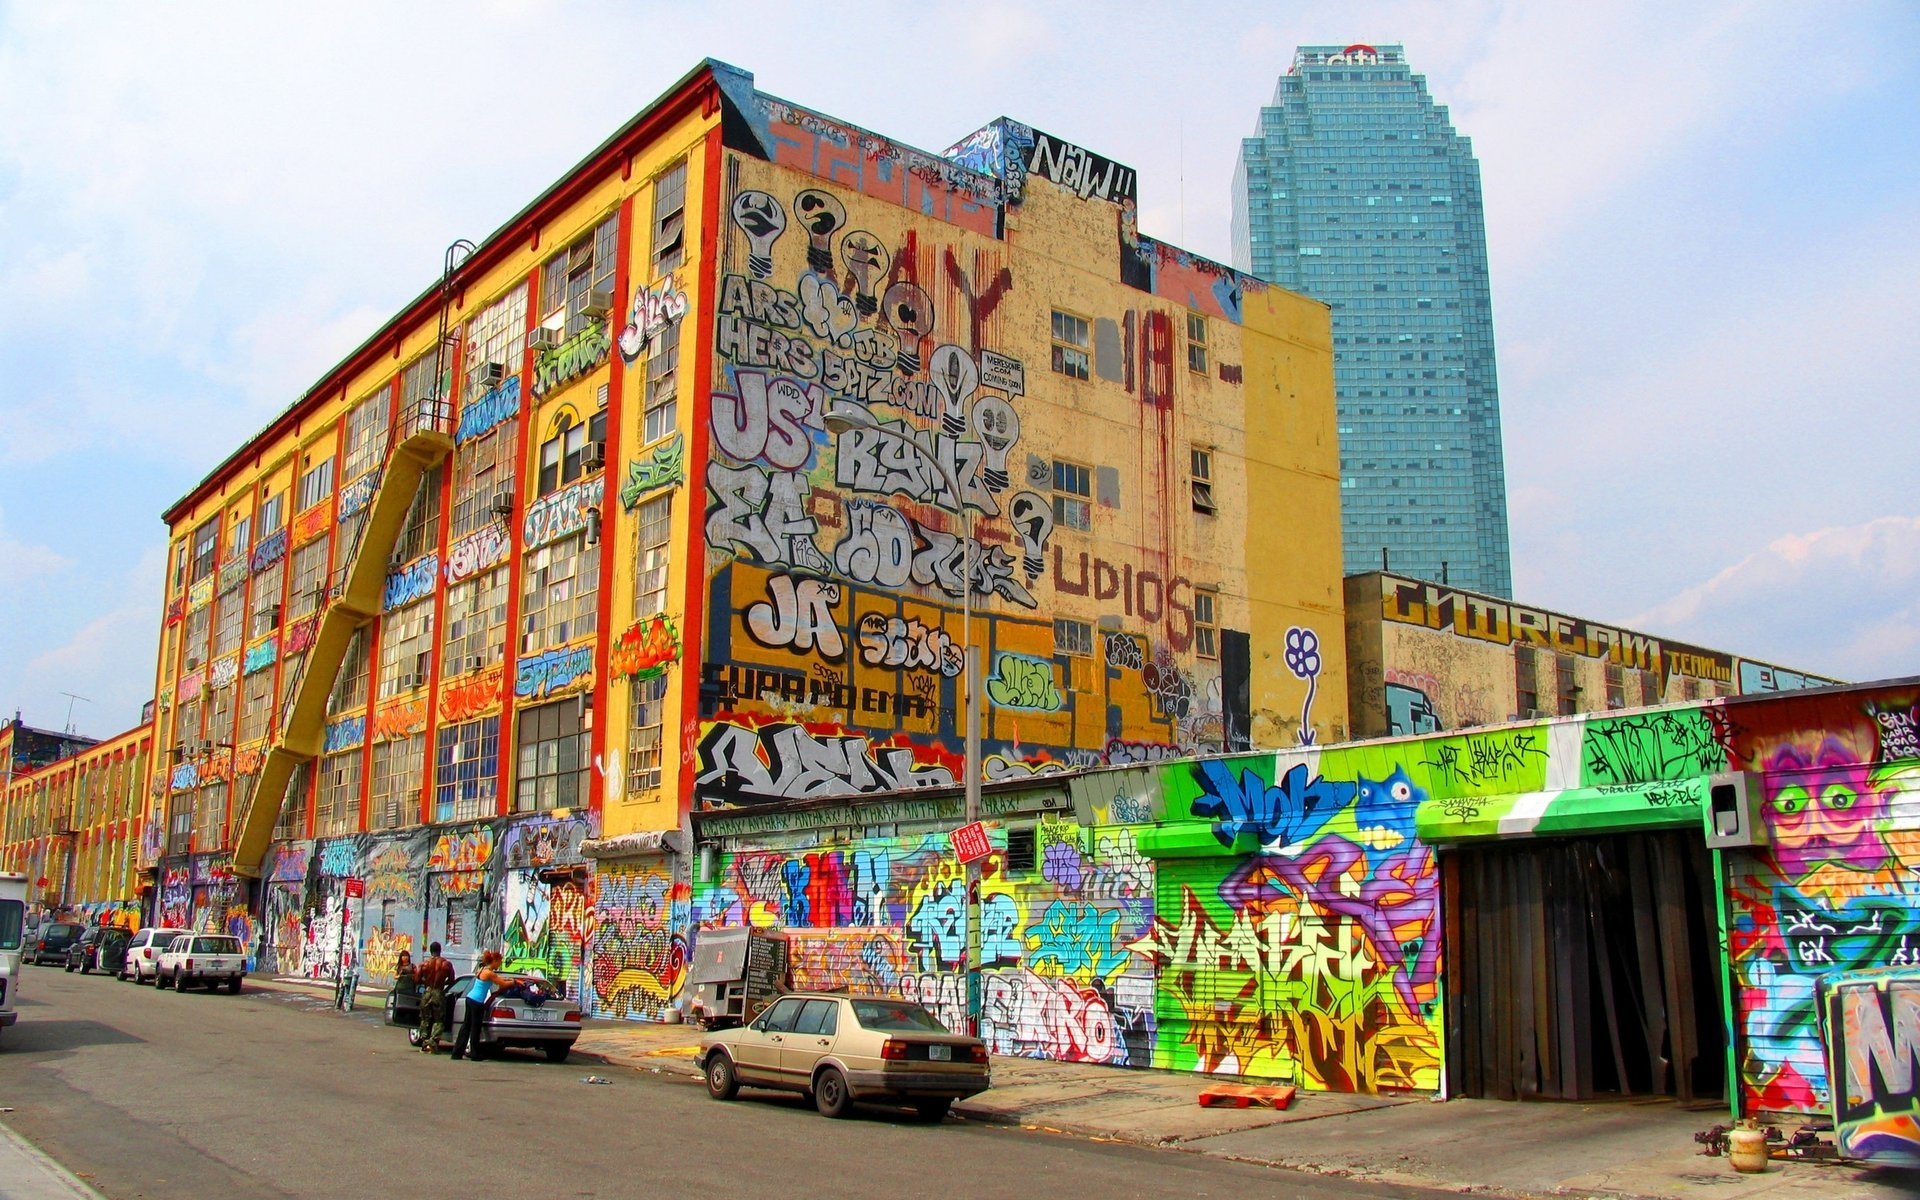 3d Christmas Wallpaper Backgrounds 2015 Graffiti City Wallpapers Hd Free Download Pixelstalk Net